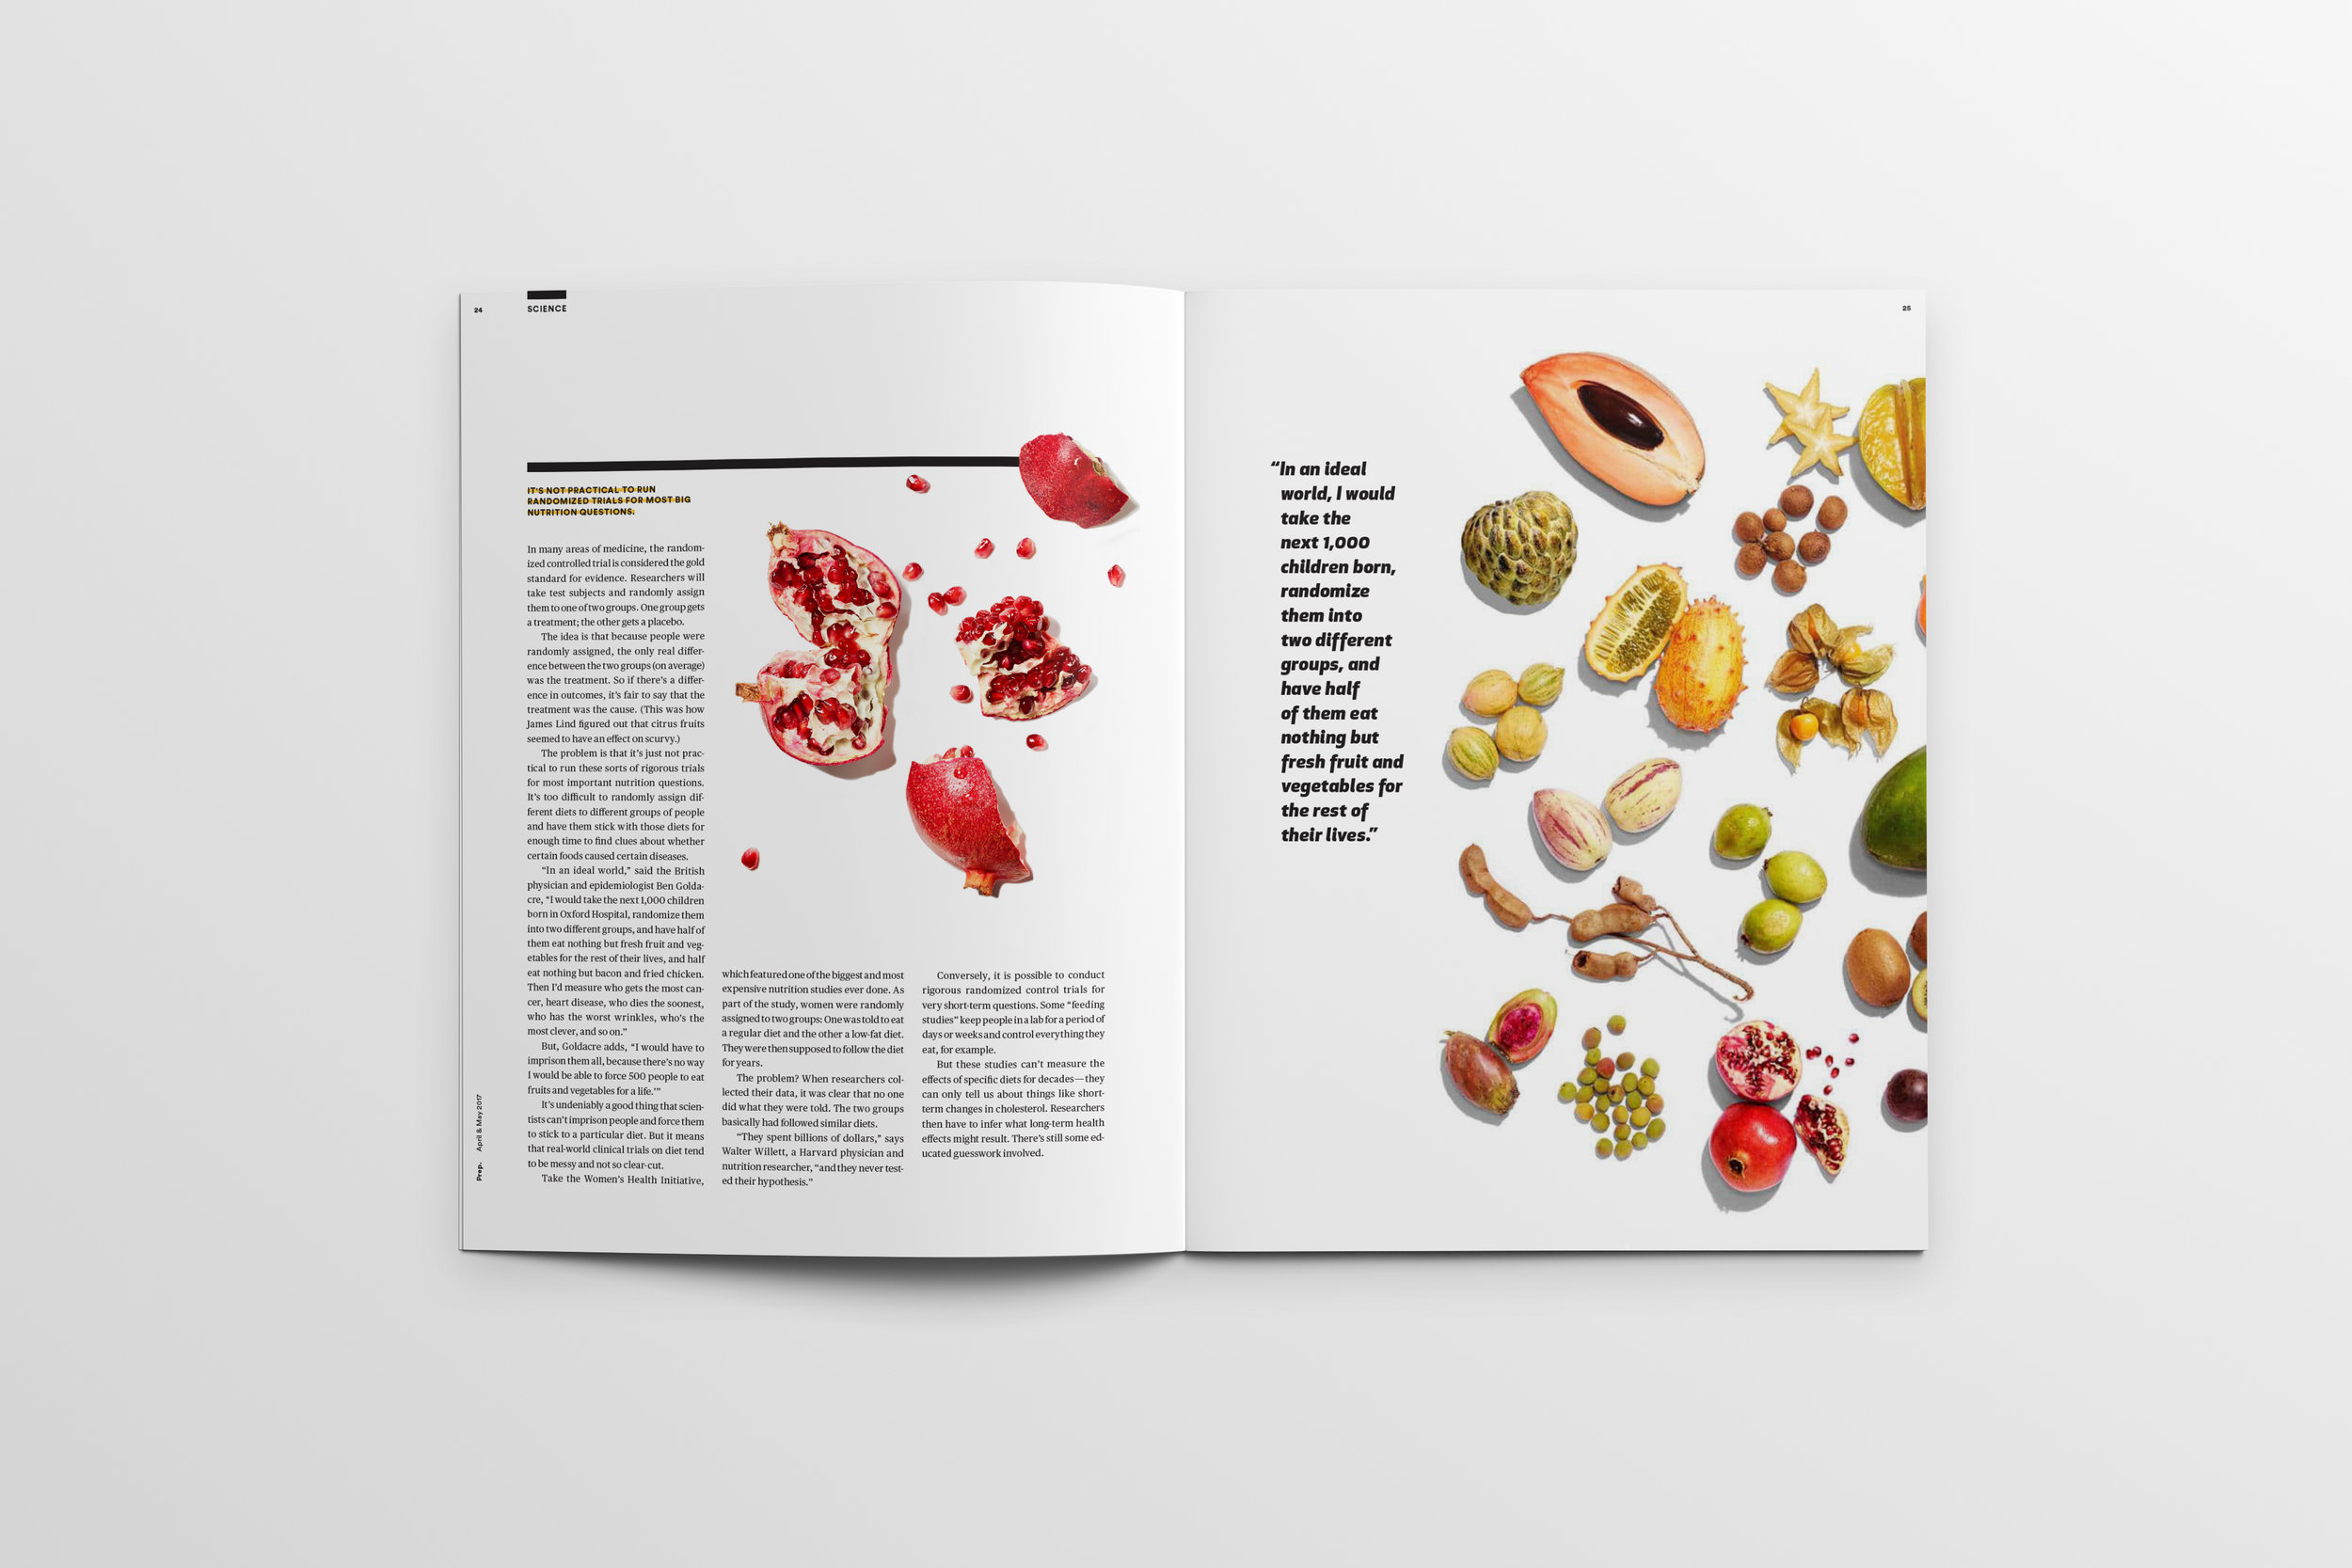 Magazine_Mockup_Pages24-25.jpg